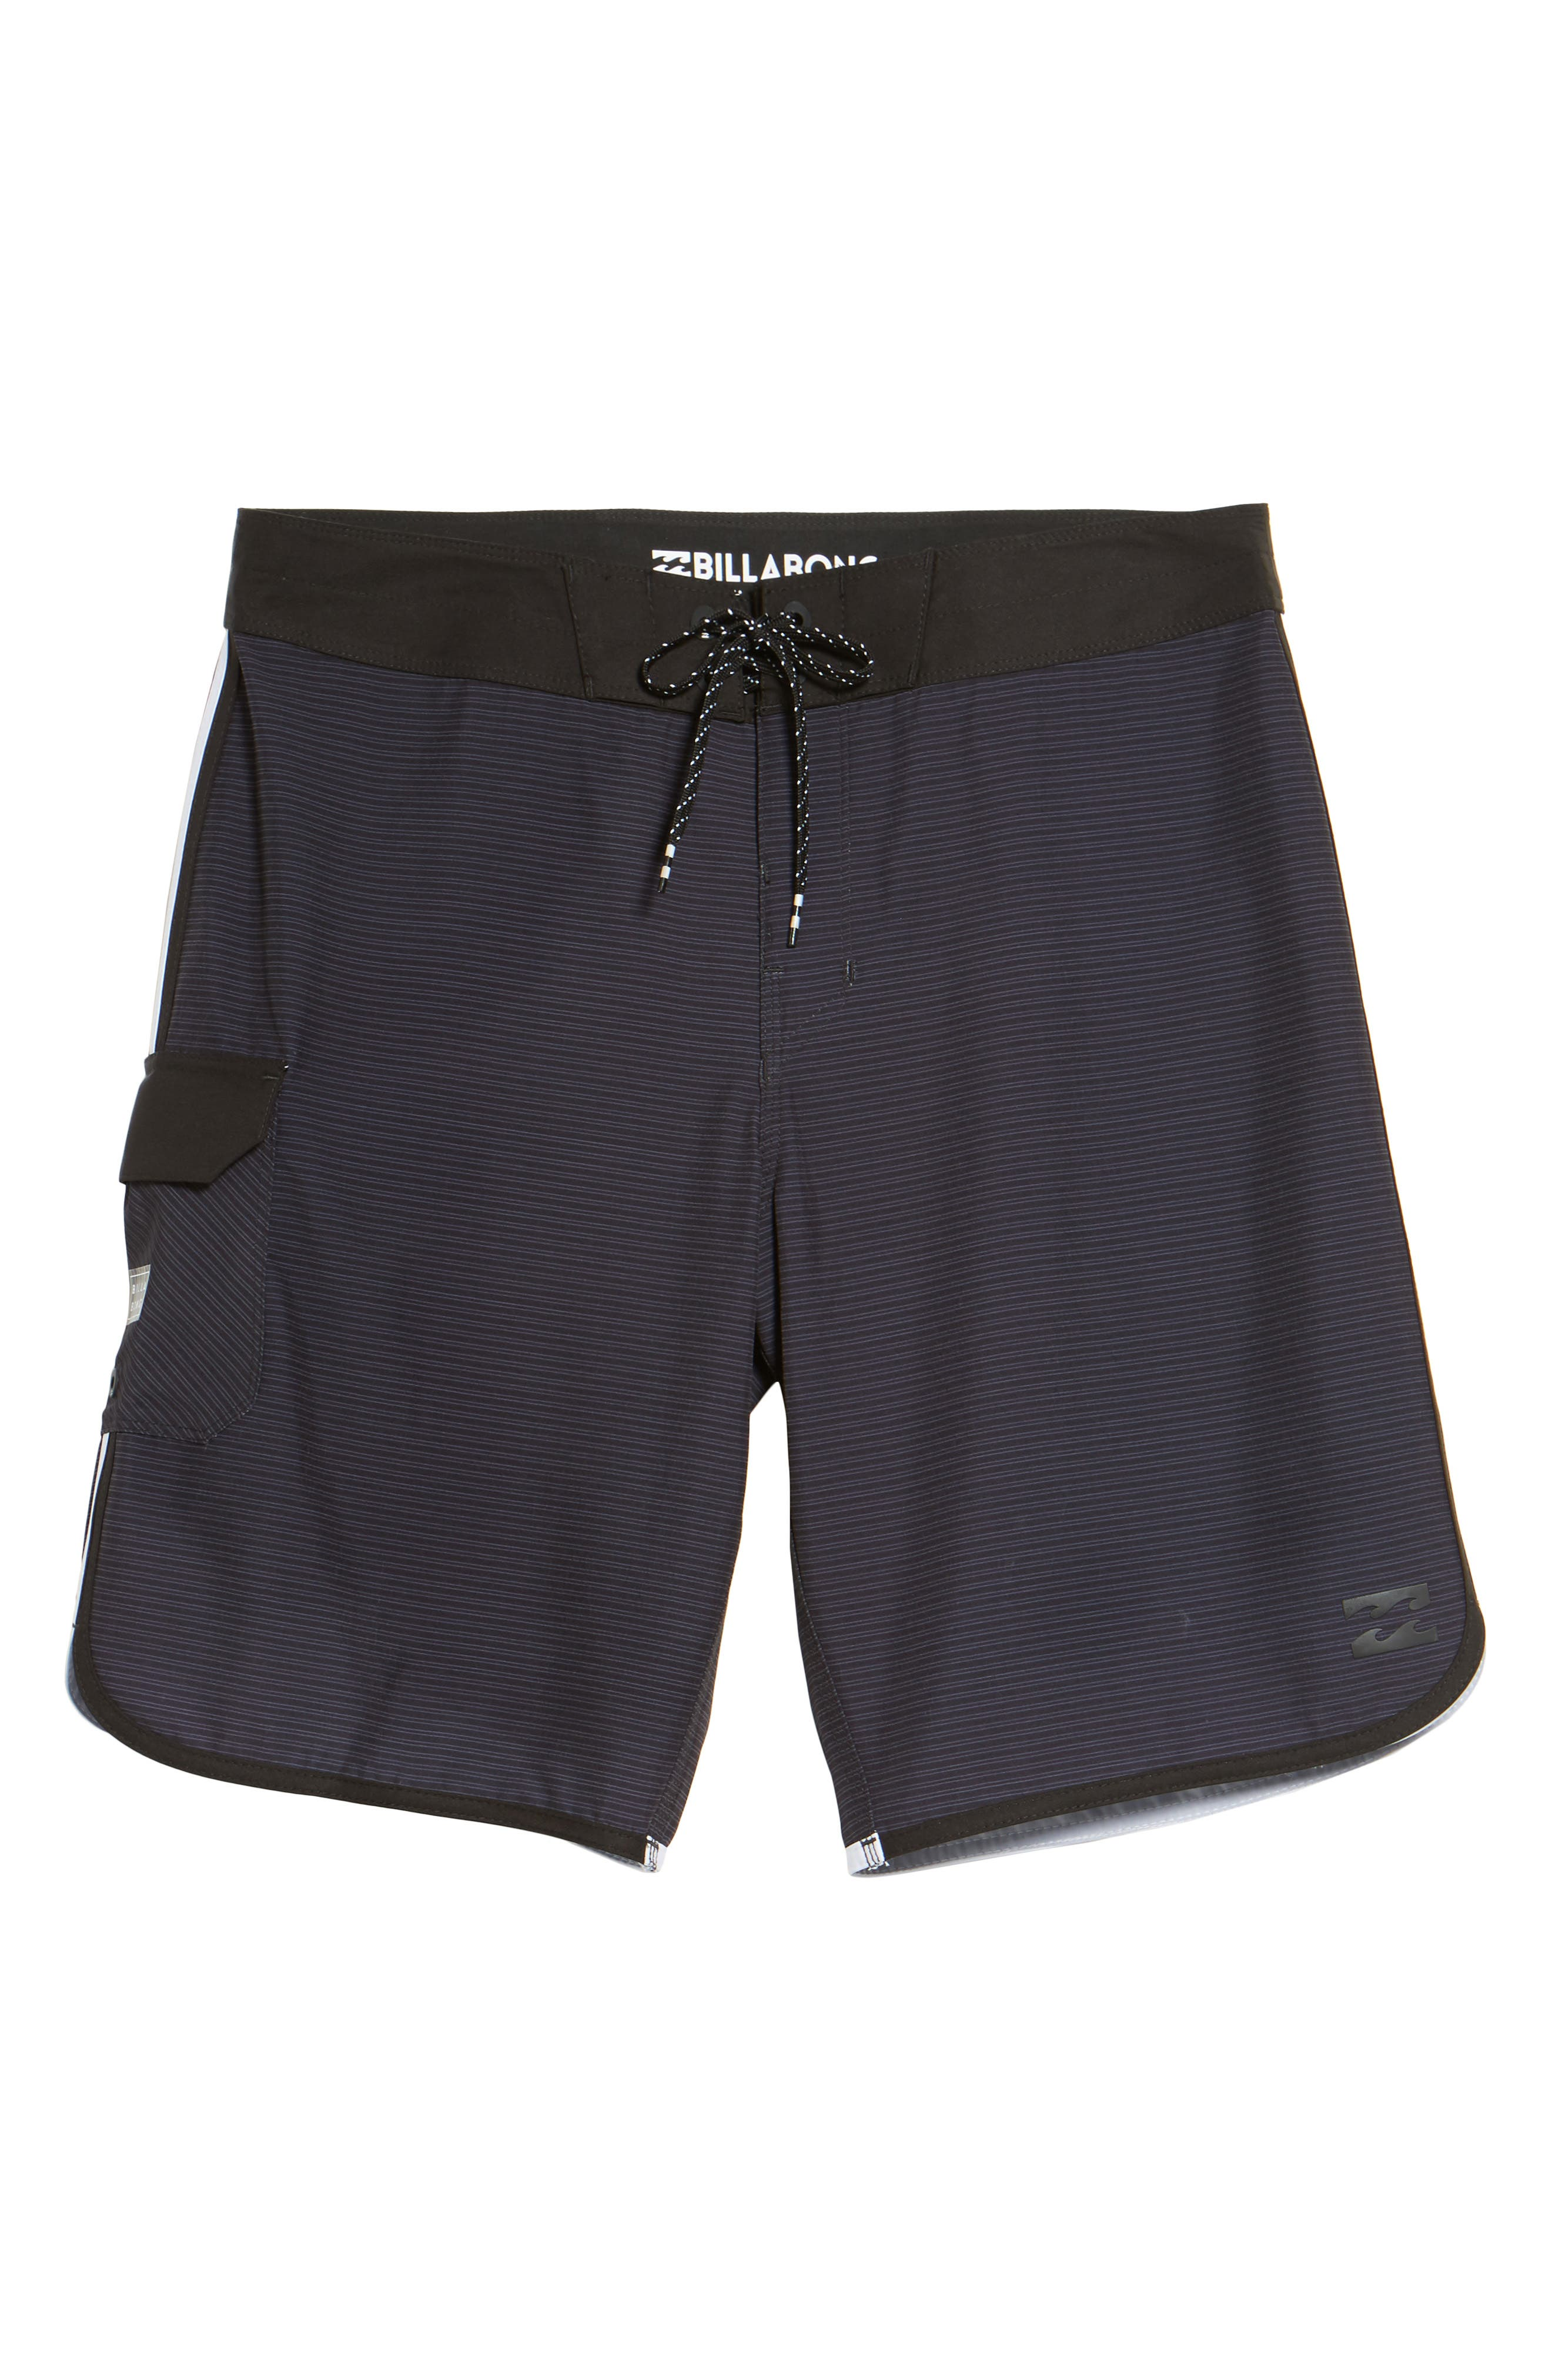 73 X Board Shorts,                             Alternate thumbnail 6, color,                             001